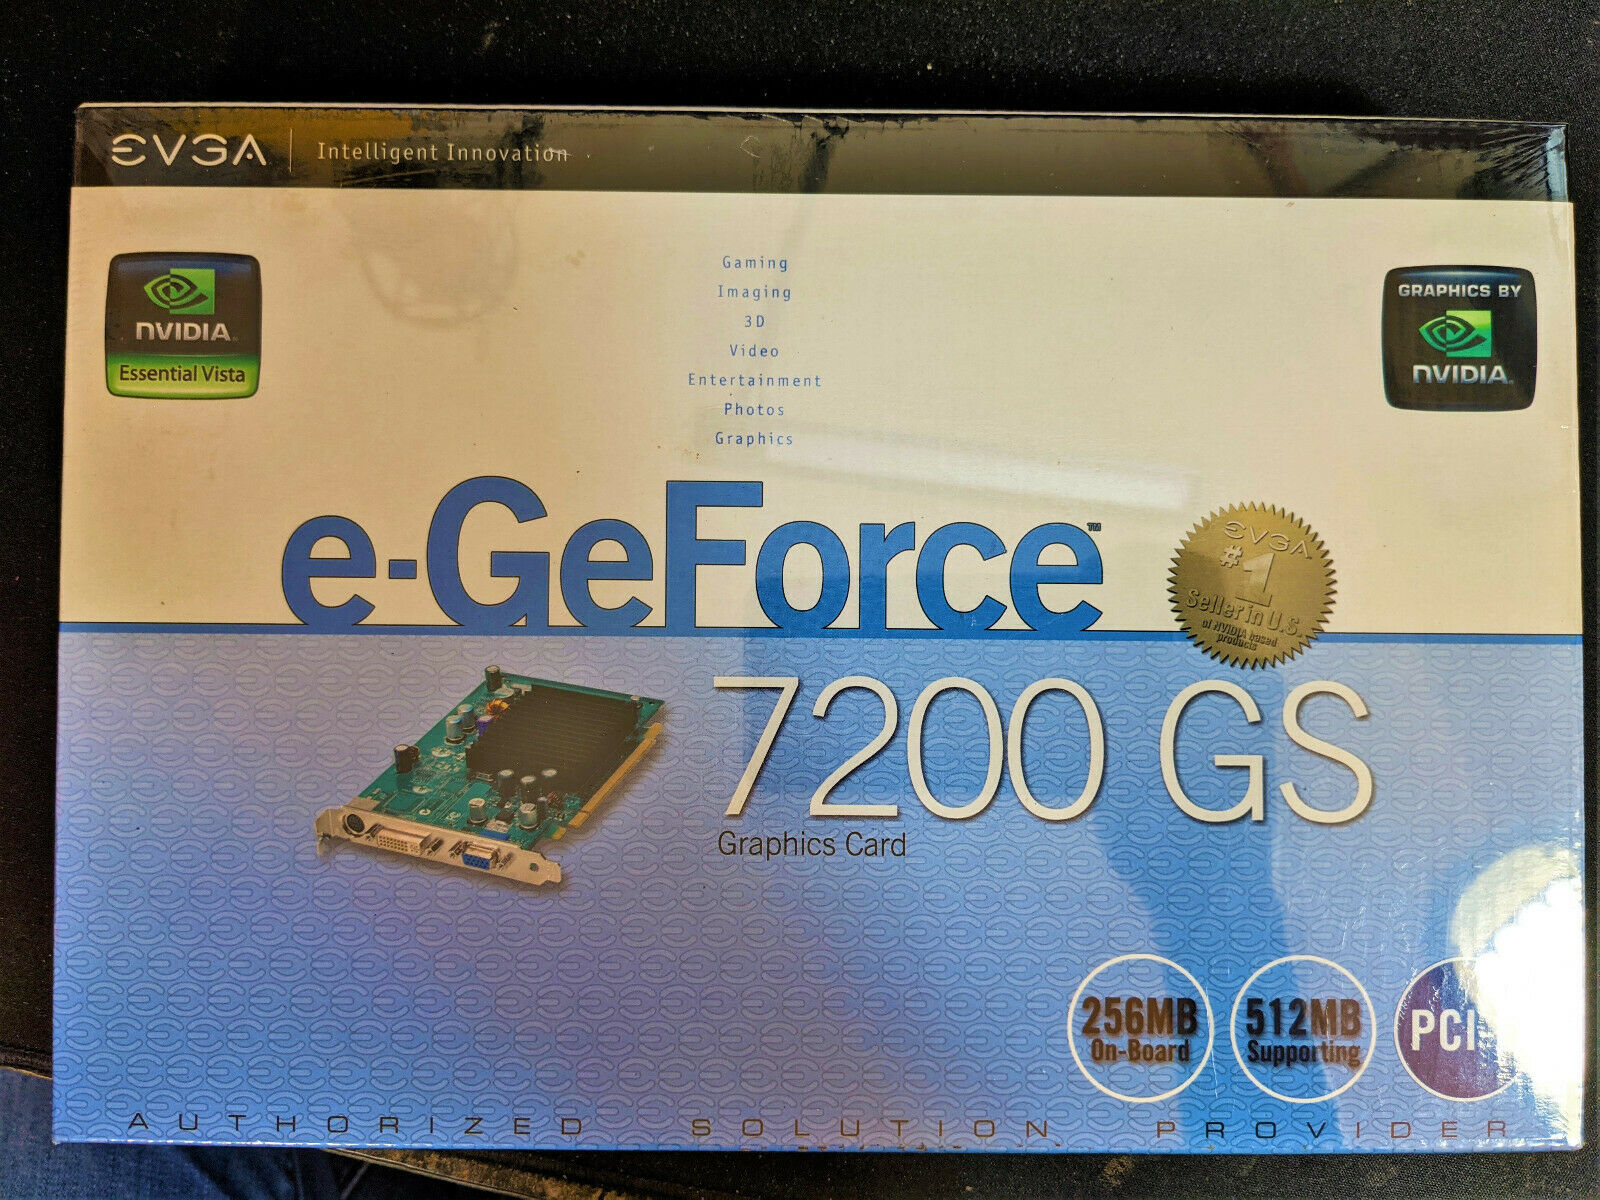 EVGA NVIDIA e-GeForce 7200 GS 256MB DDR2 PCI-E x16 1.0 New Sealed In Box